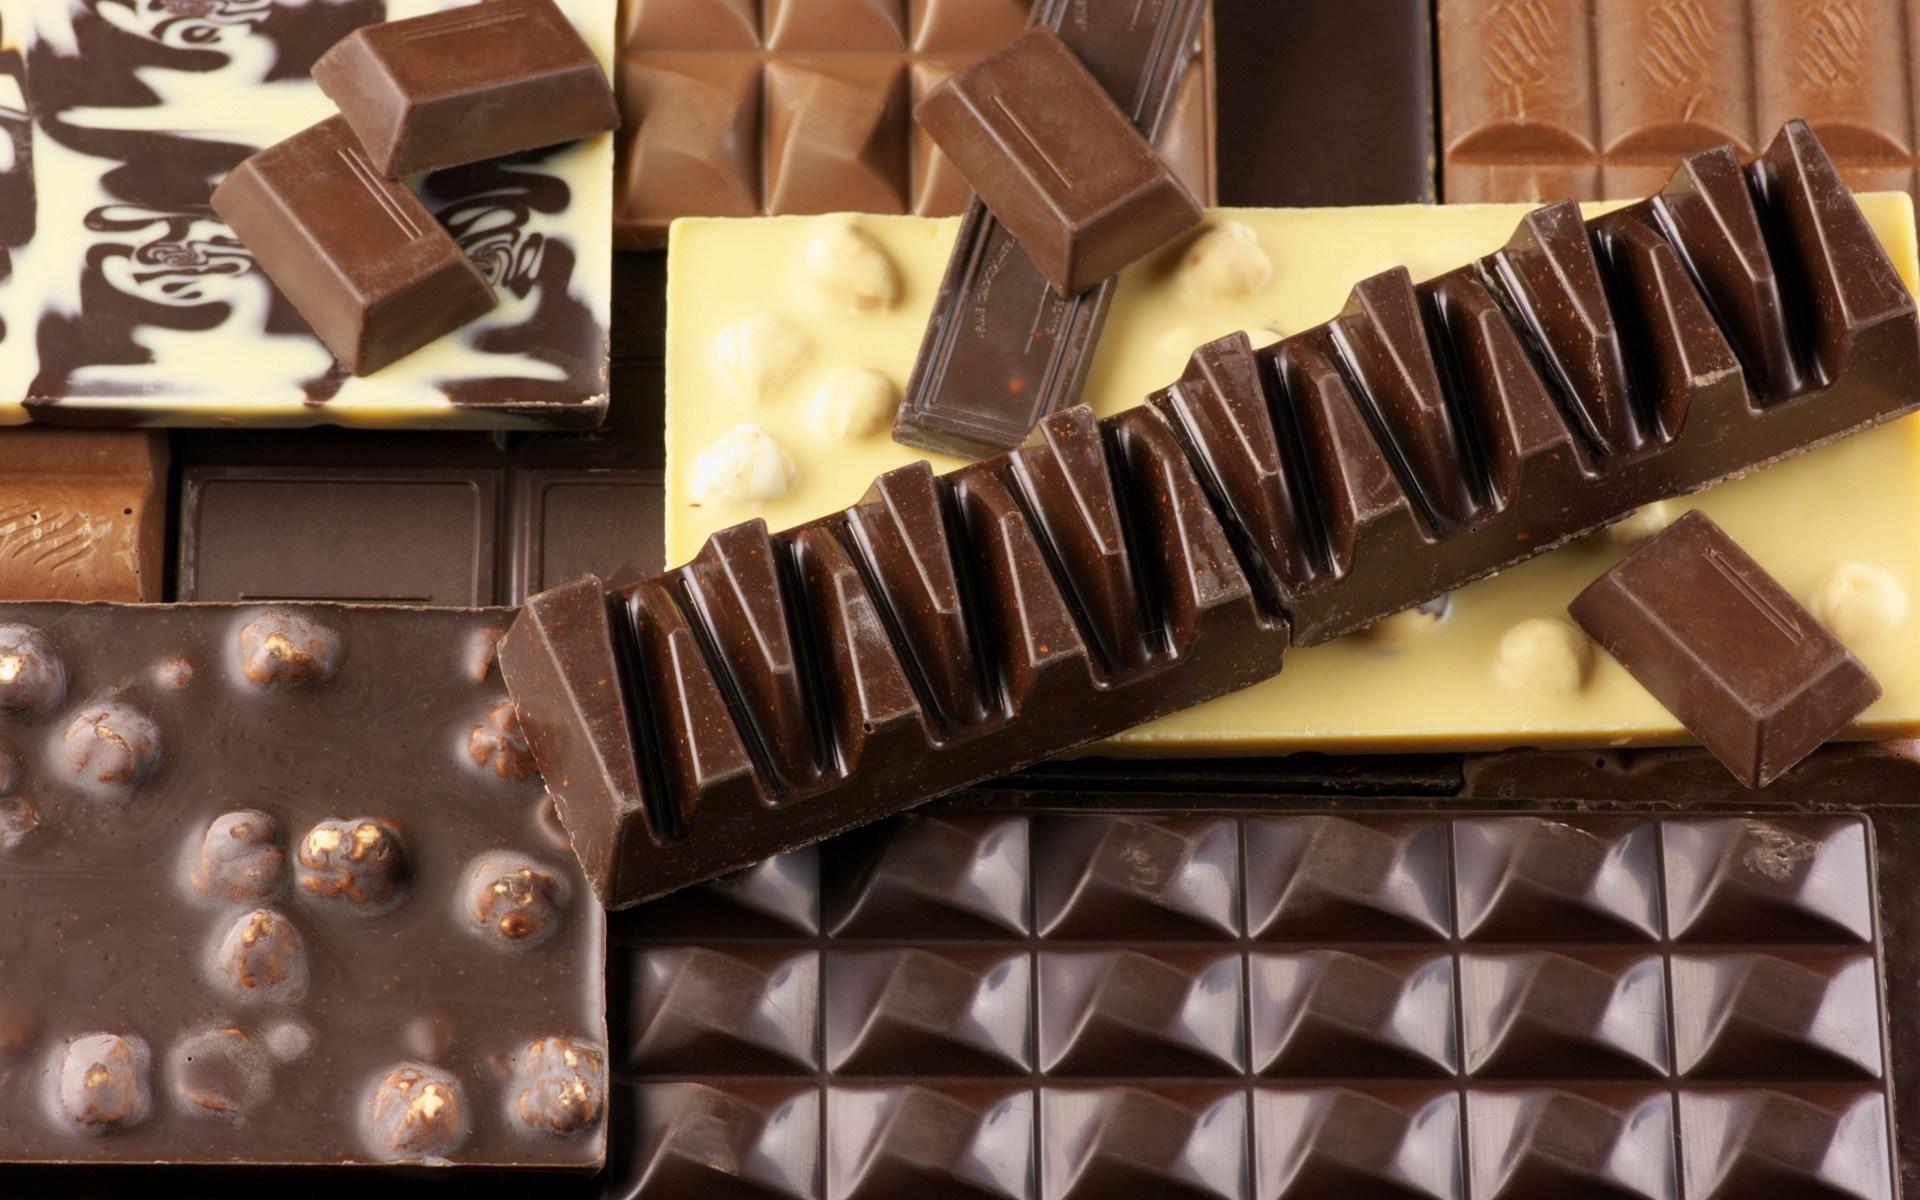 hinh nen chocolate 28